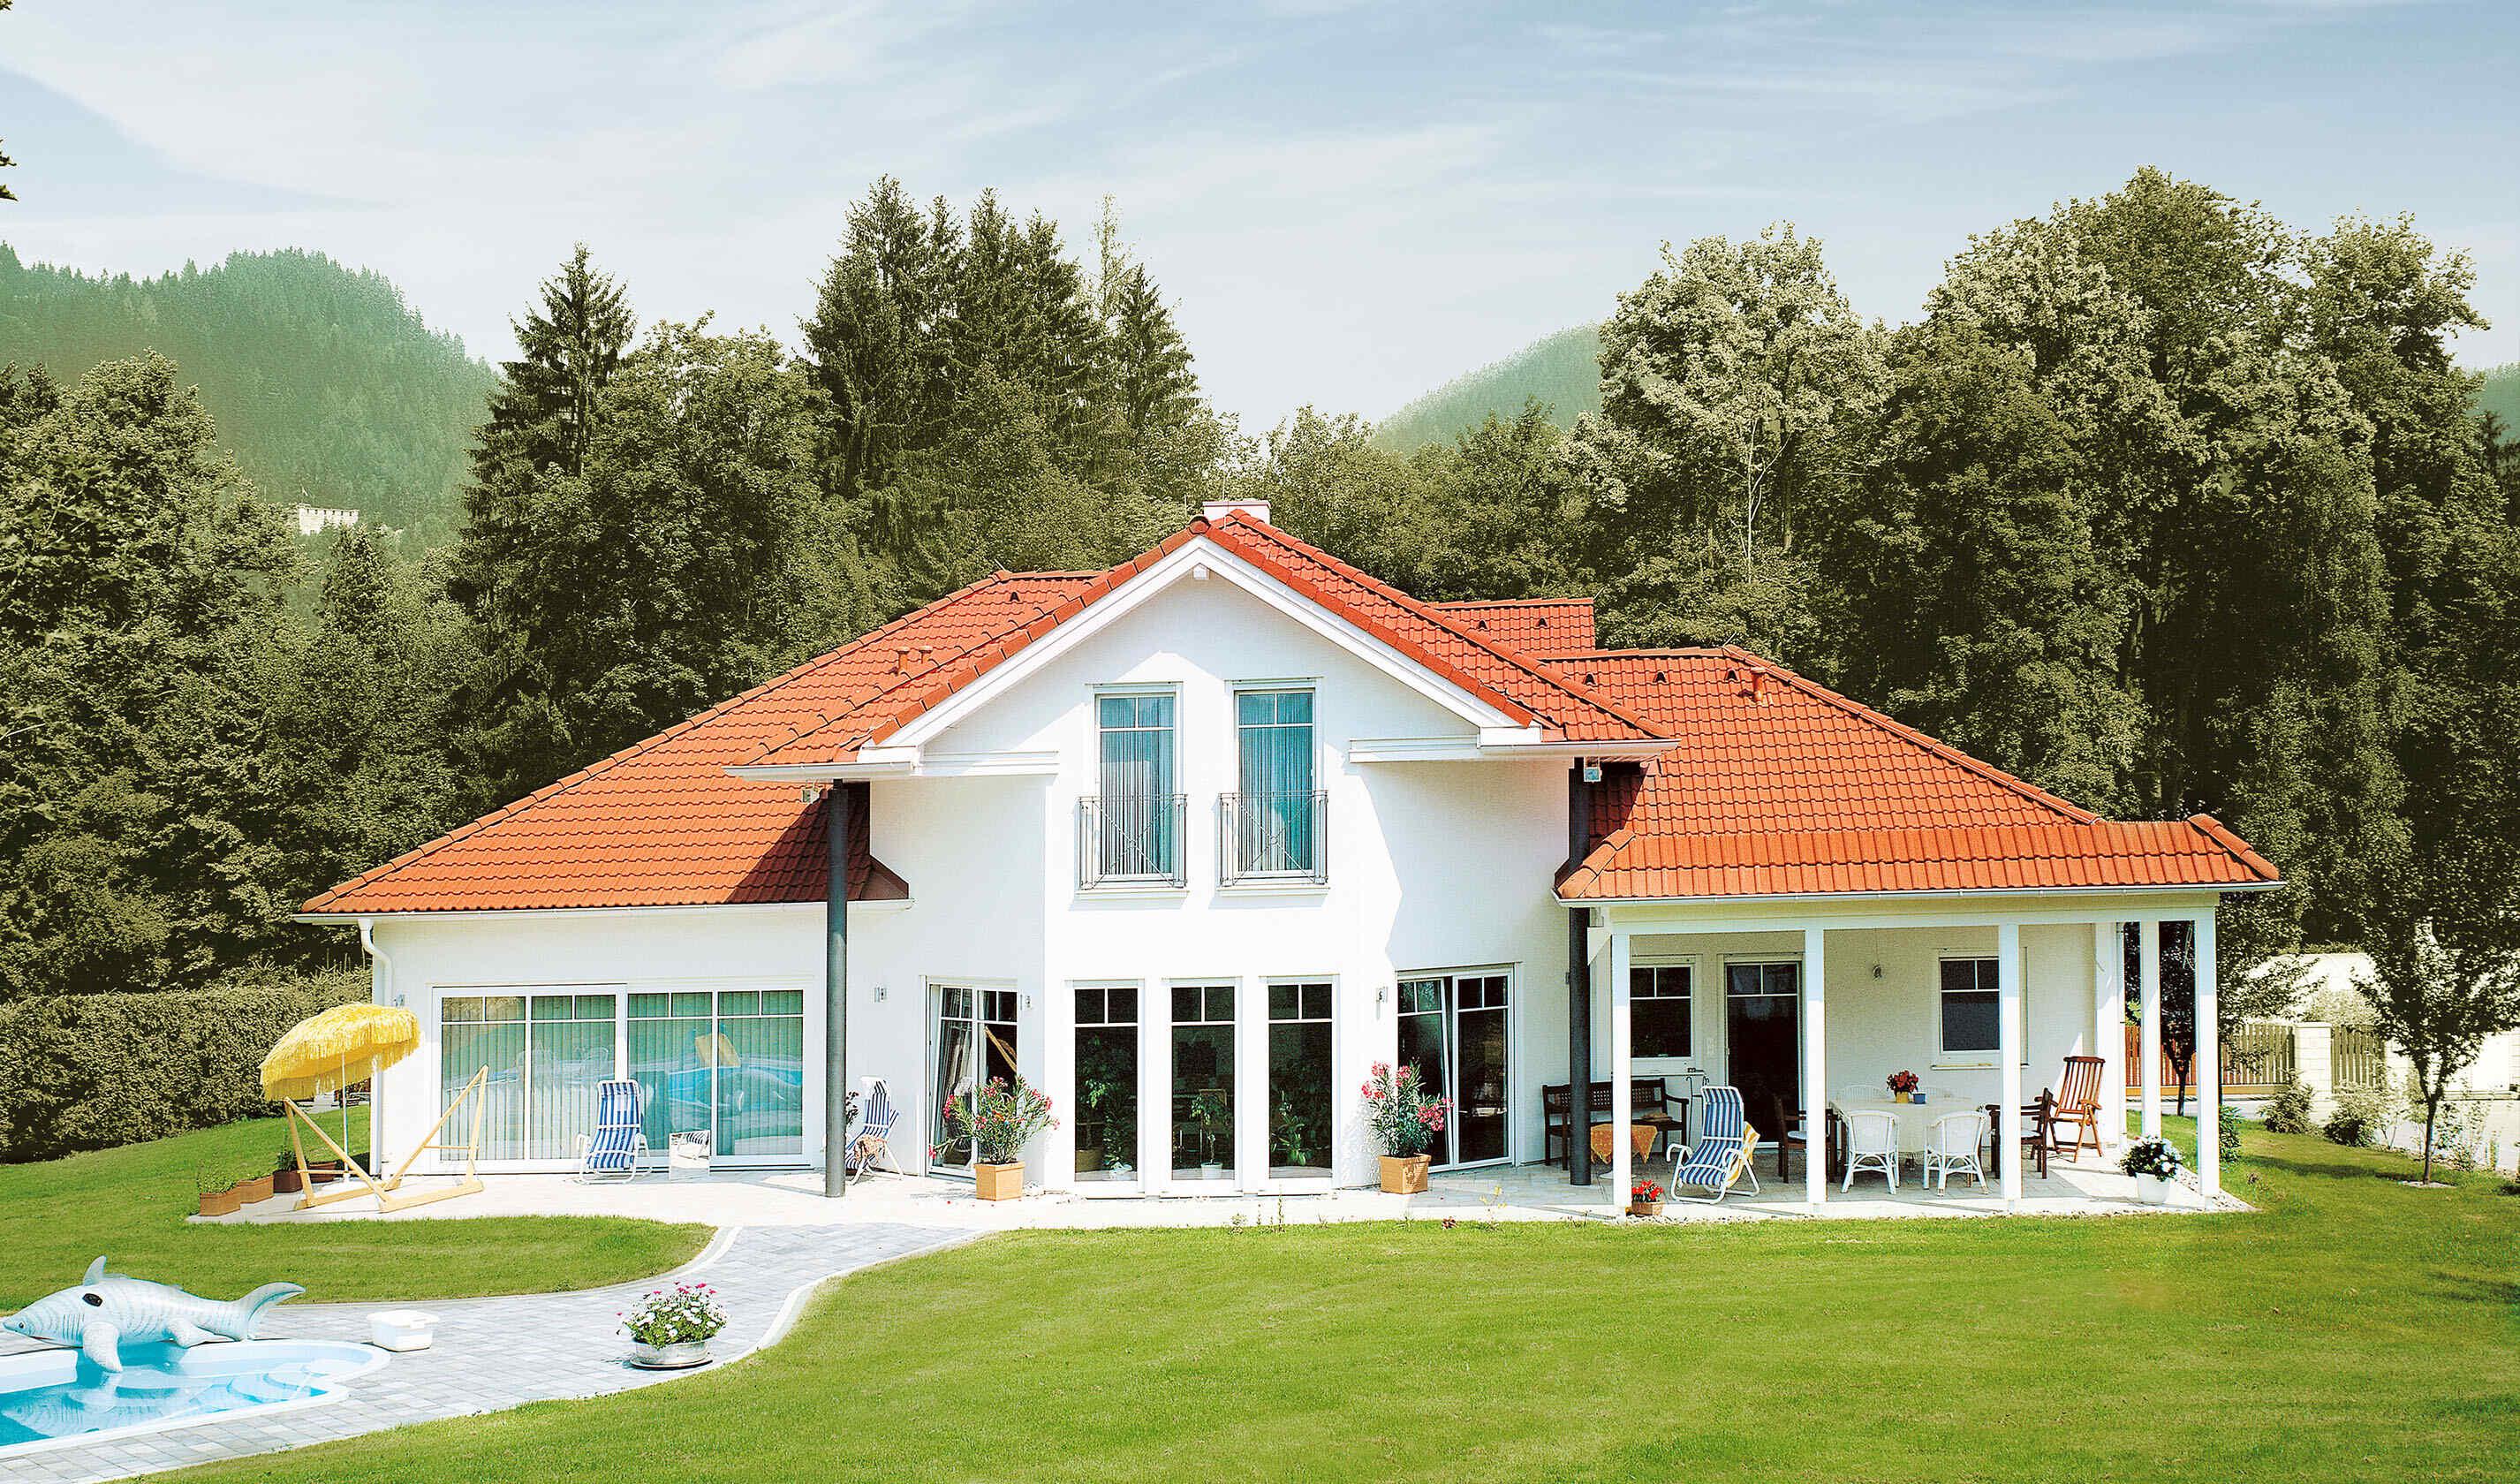 Dachform fassade individuell geplant vario haus for Piani casa bungalow bassa campagna